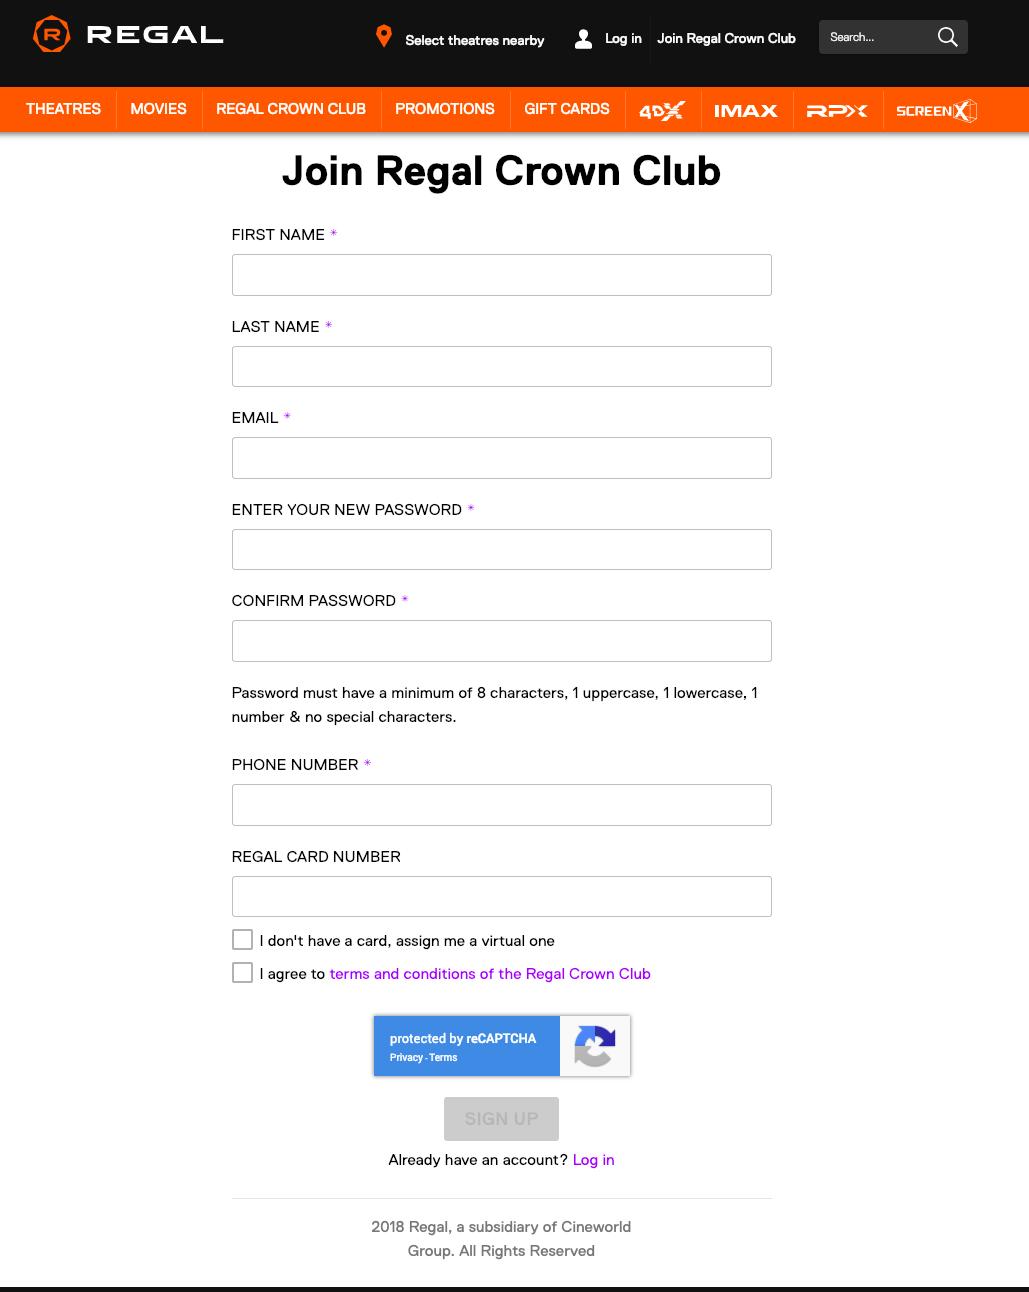 regal crown club sign up